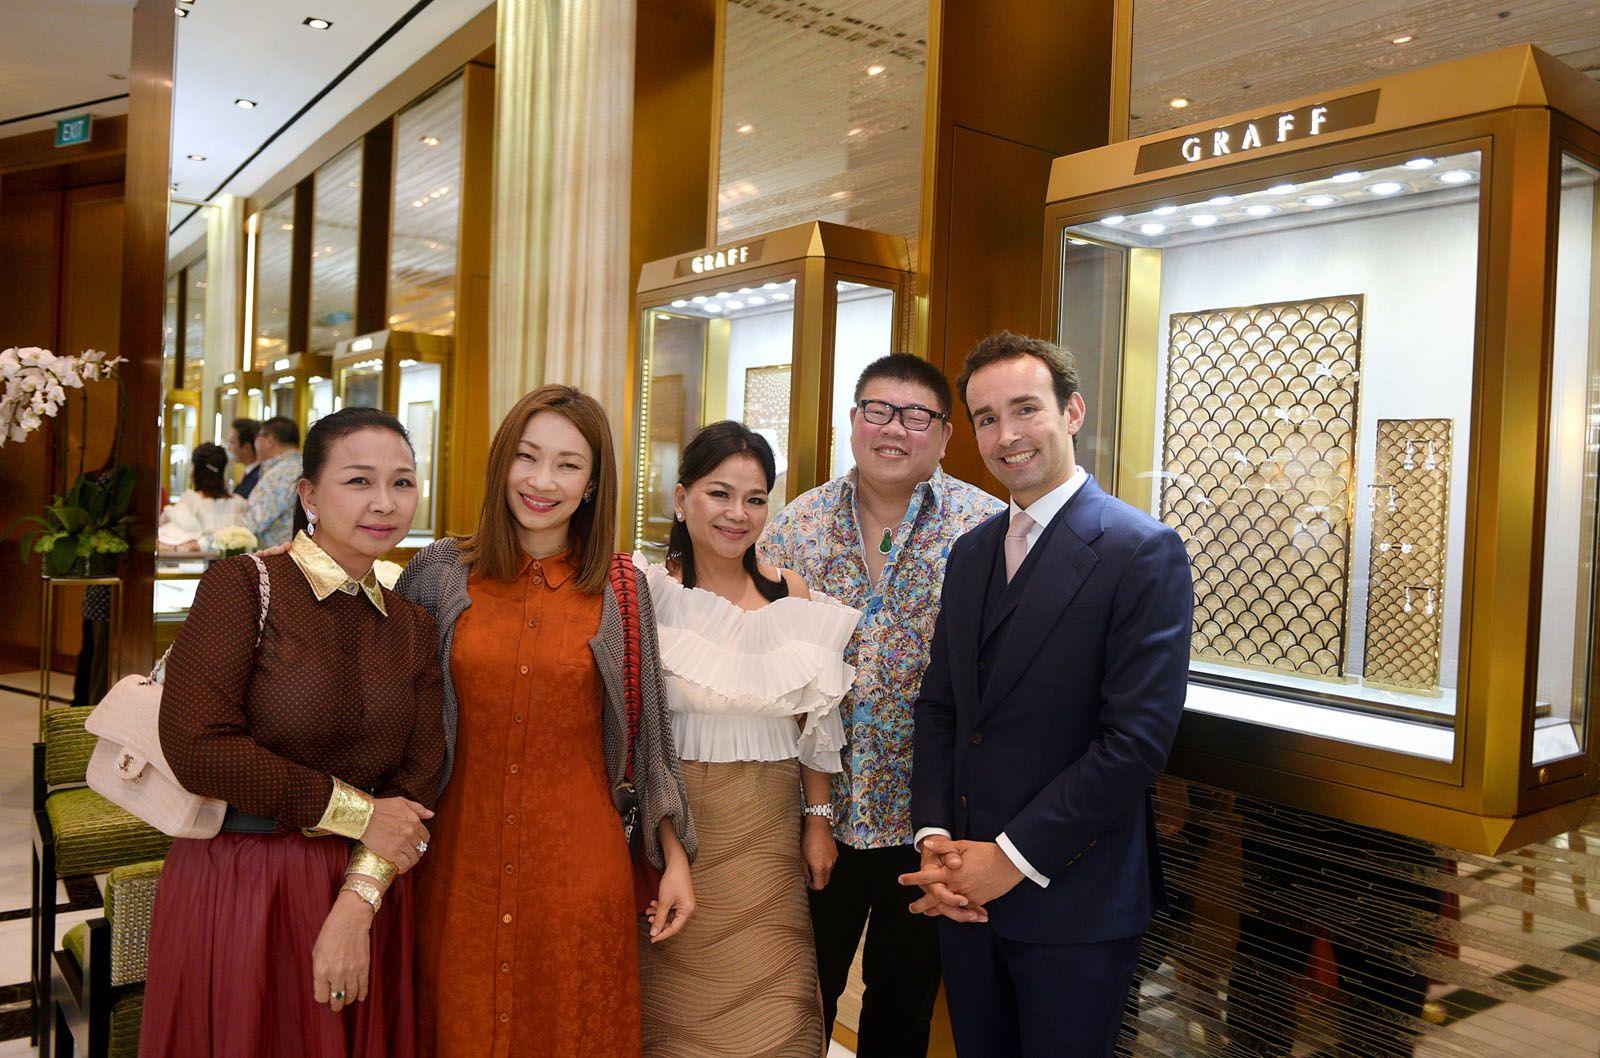 Dawn Yip, Corinne Ng, Jean Yip, Jimmy Leong, Nicolas Frechet